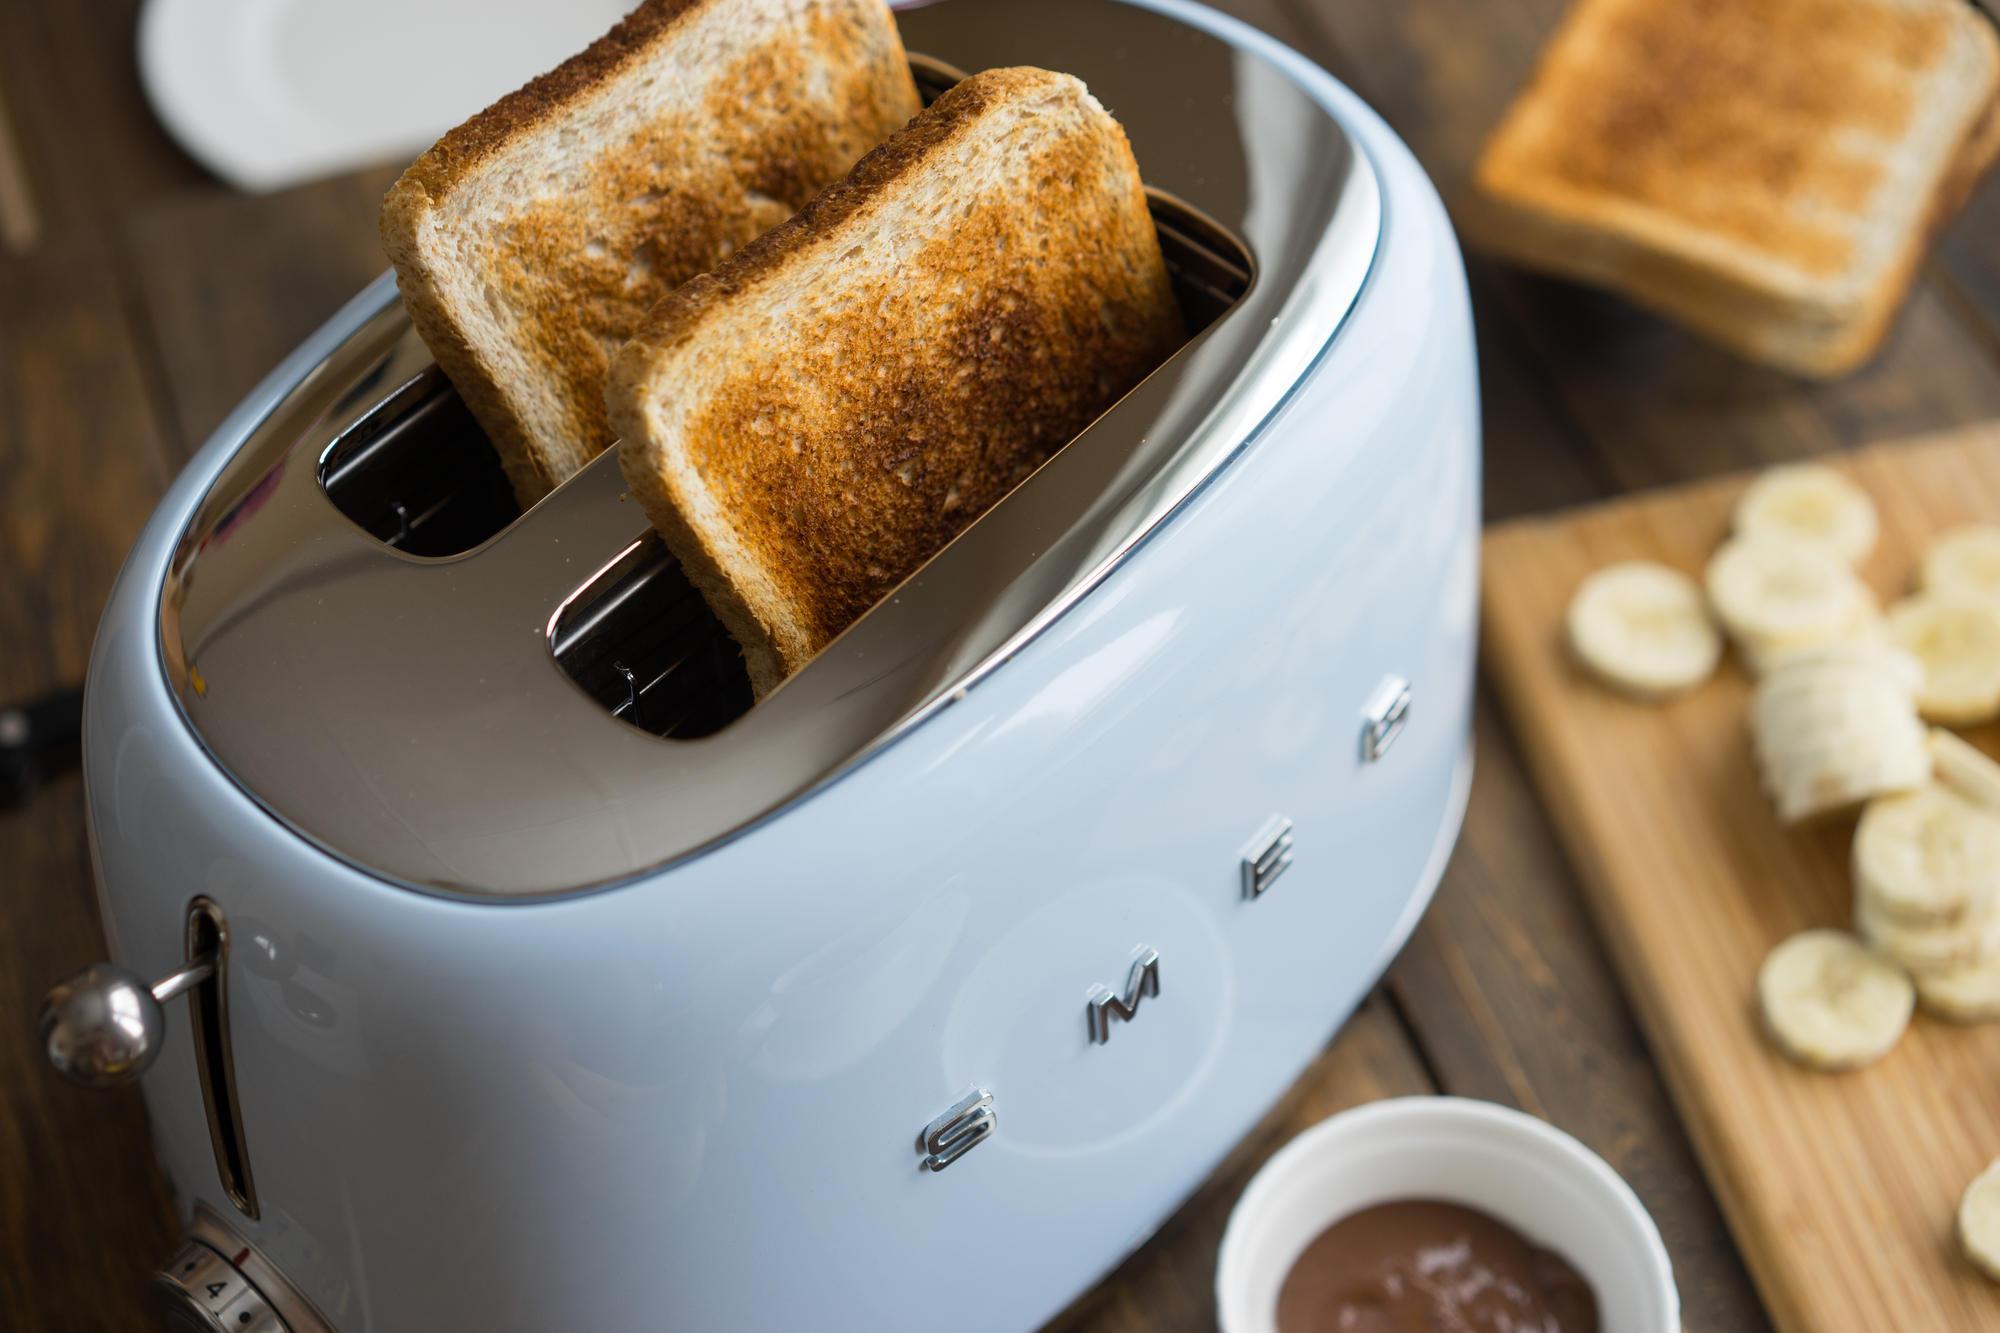 WEB_TSF01PBEU_64.jpg-smeg-toaster-retro-design-50s-60s-shop-bleywaren